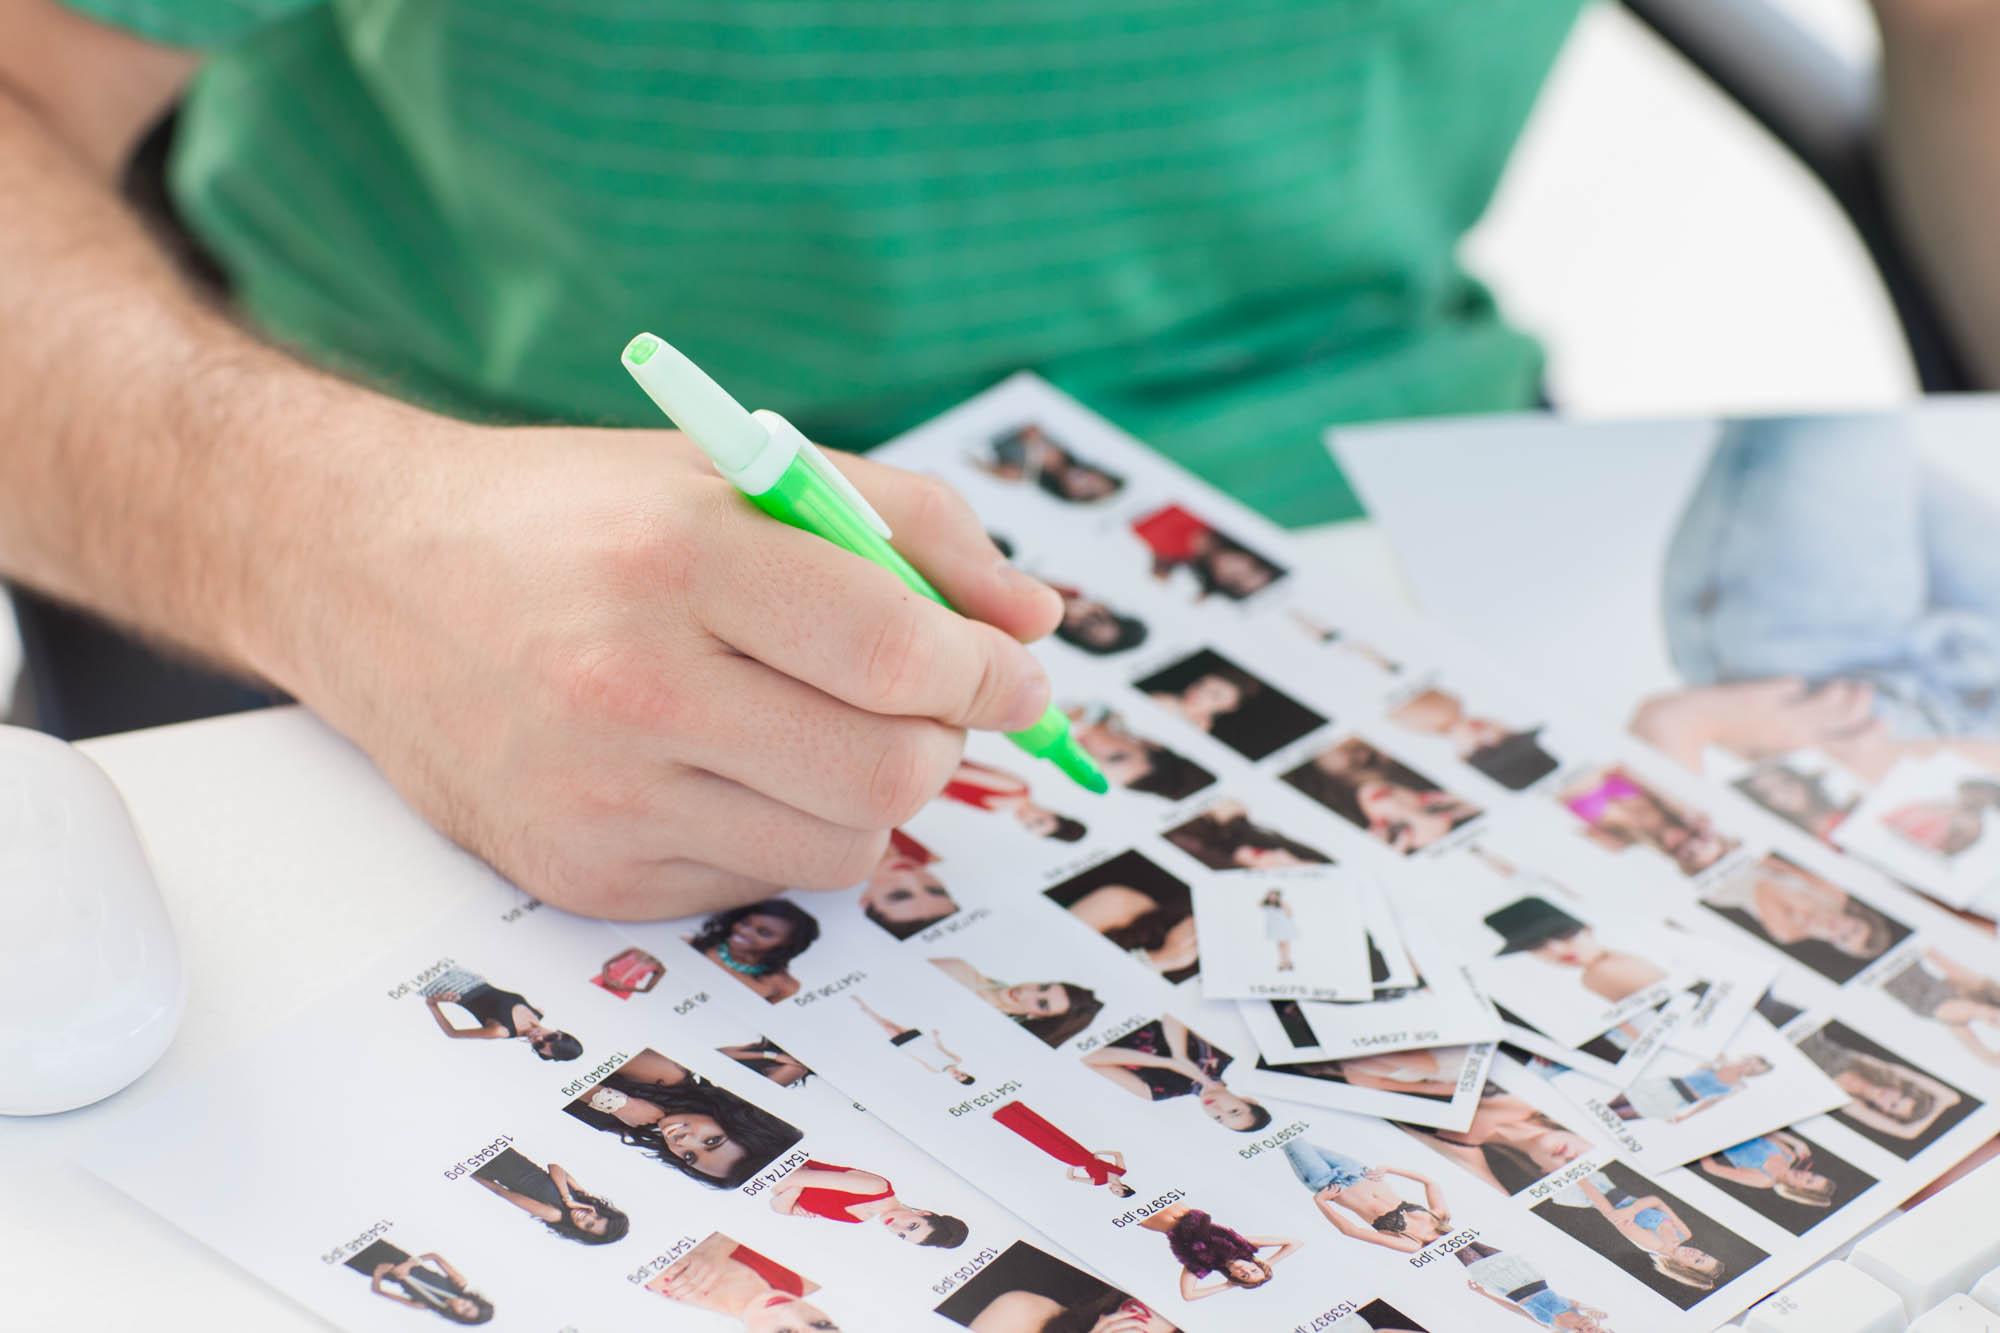 Photo editor looking through contact sheets